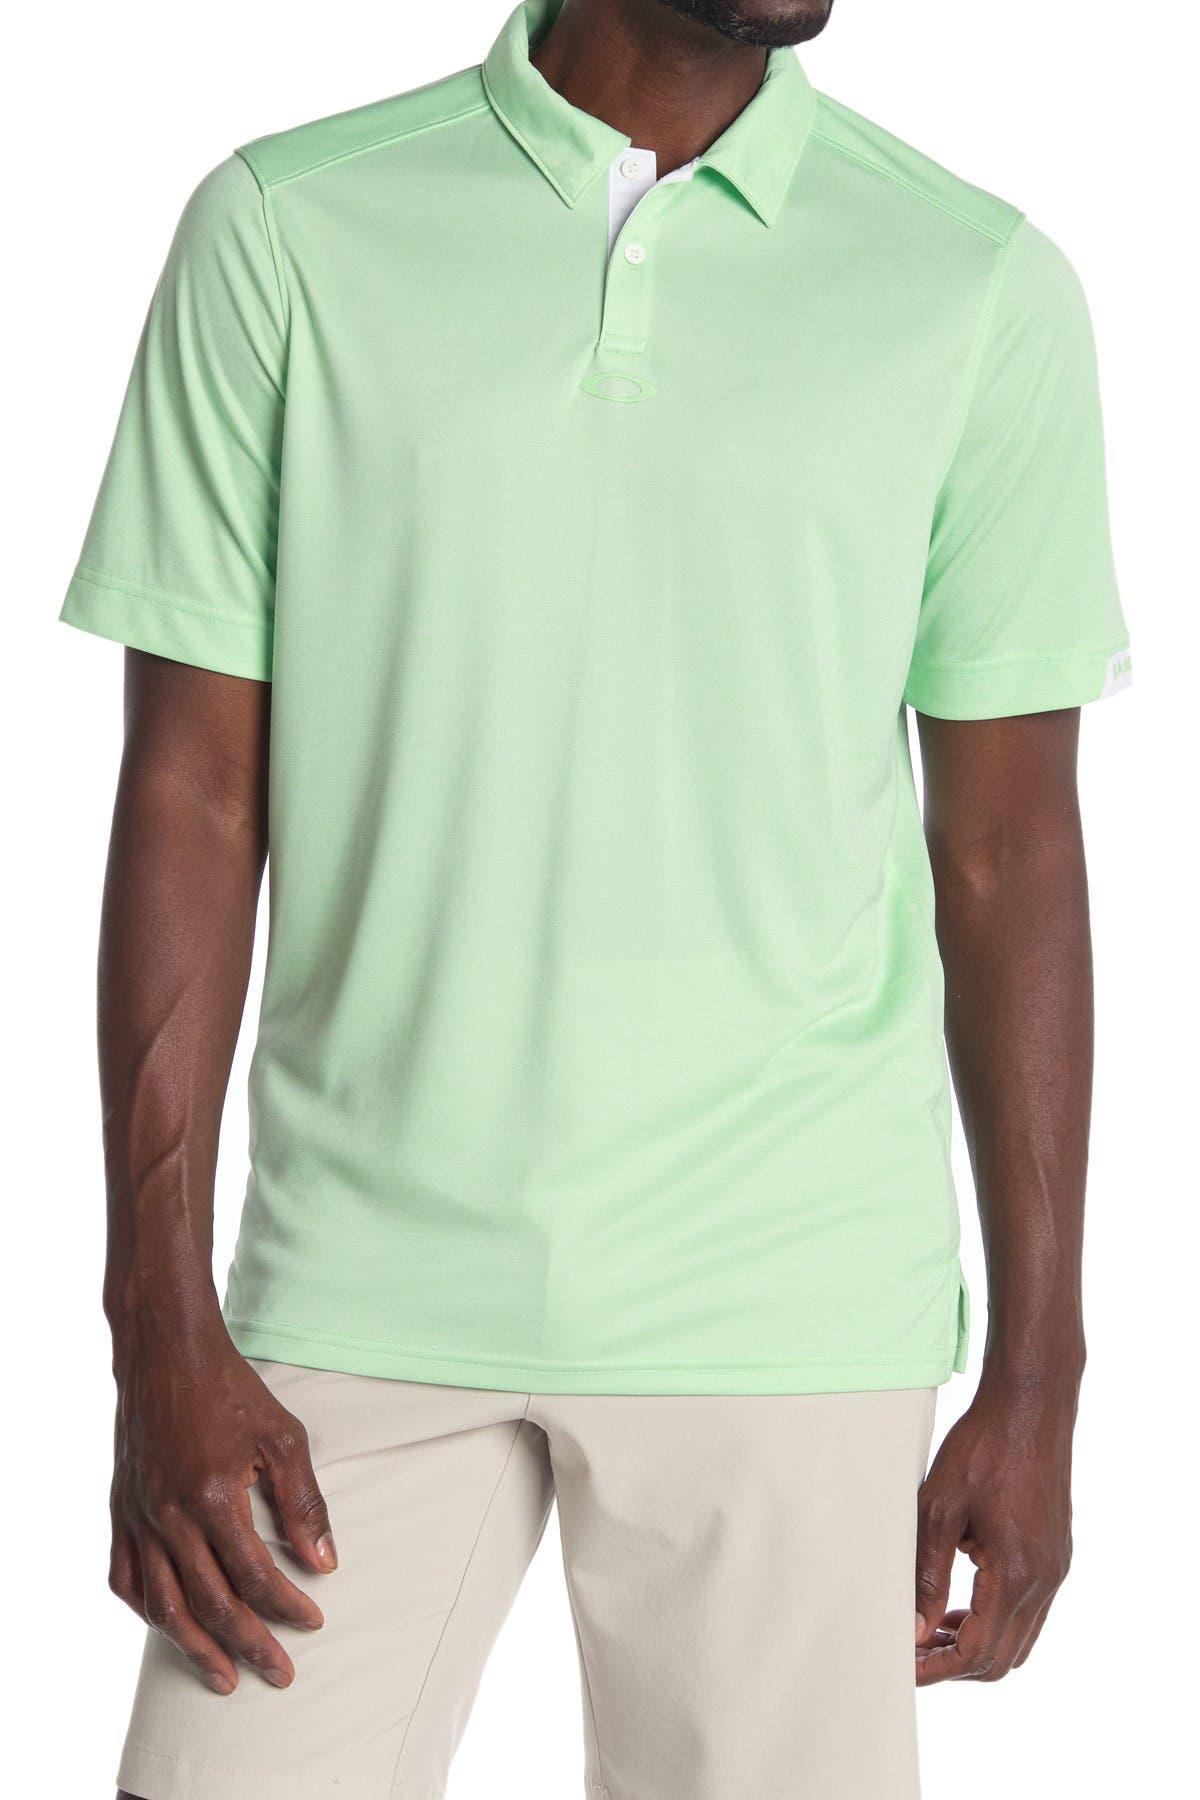 Image of Oakley Gravity Golf Polo